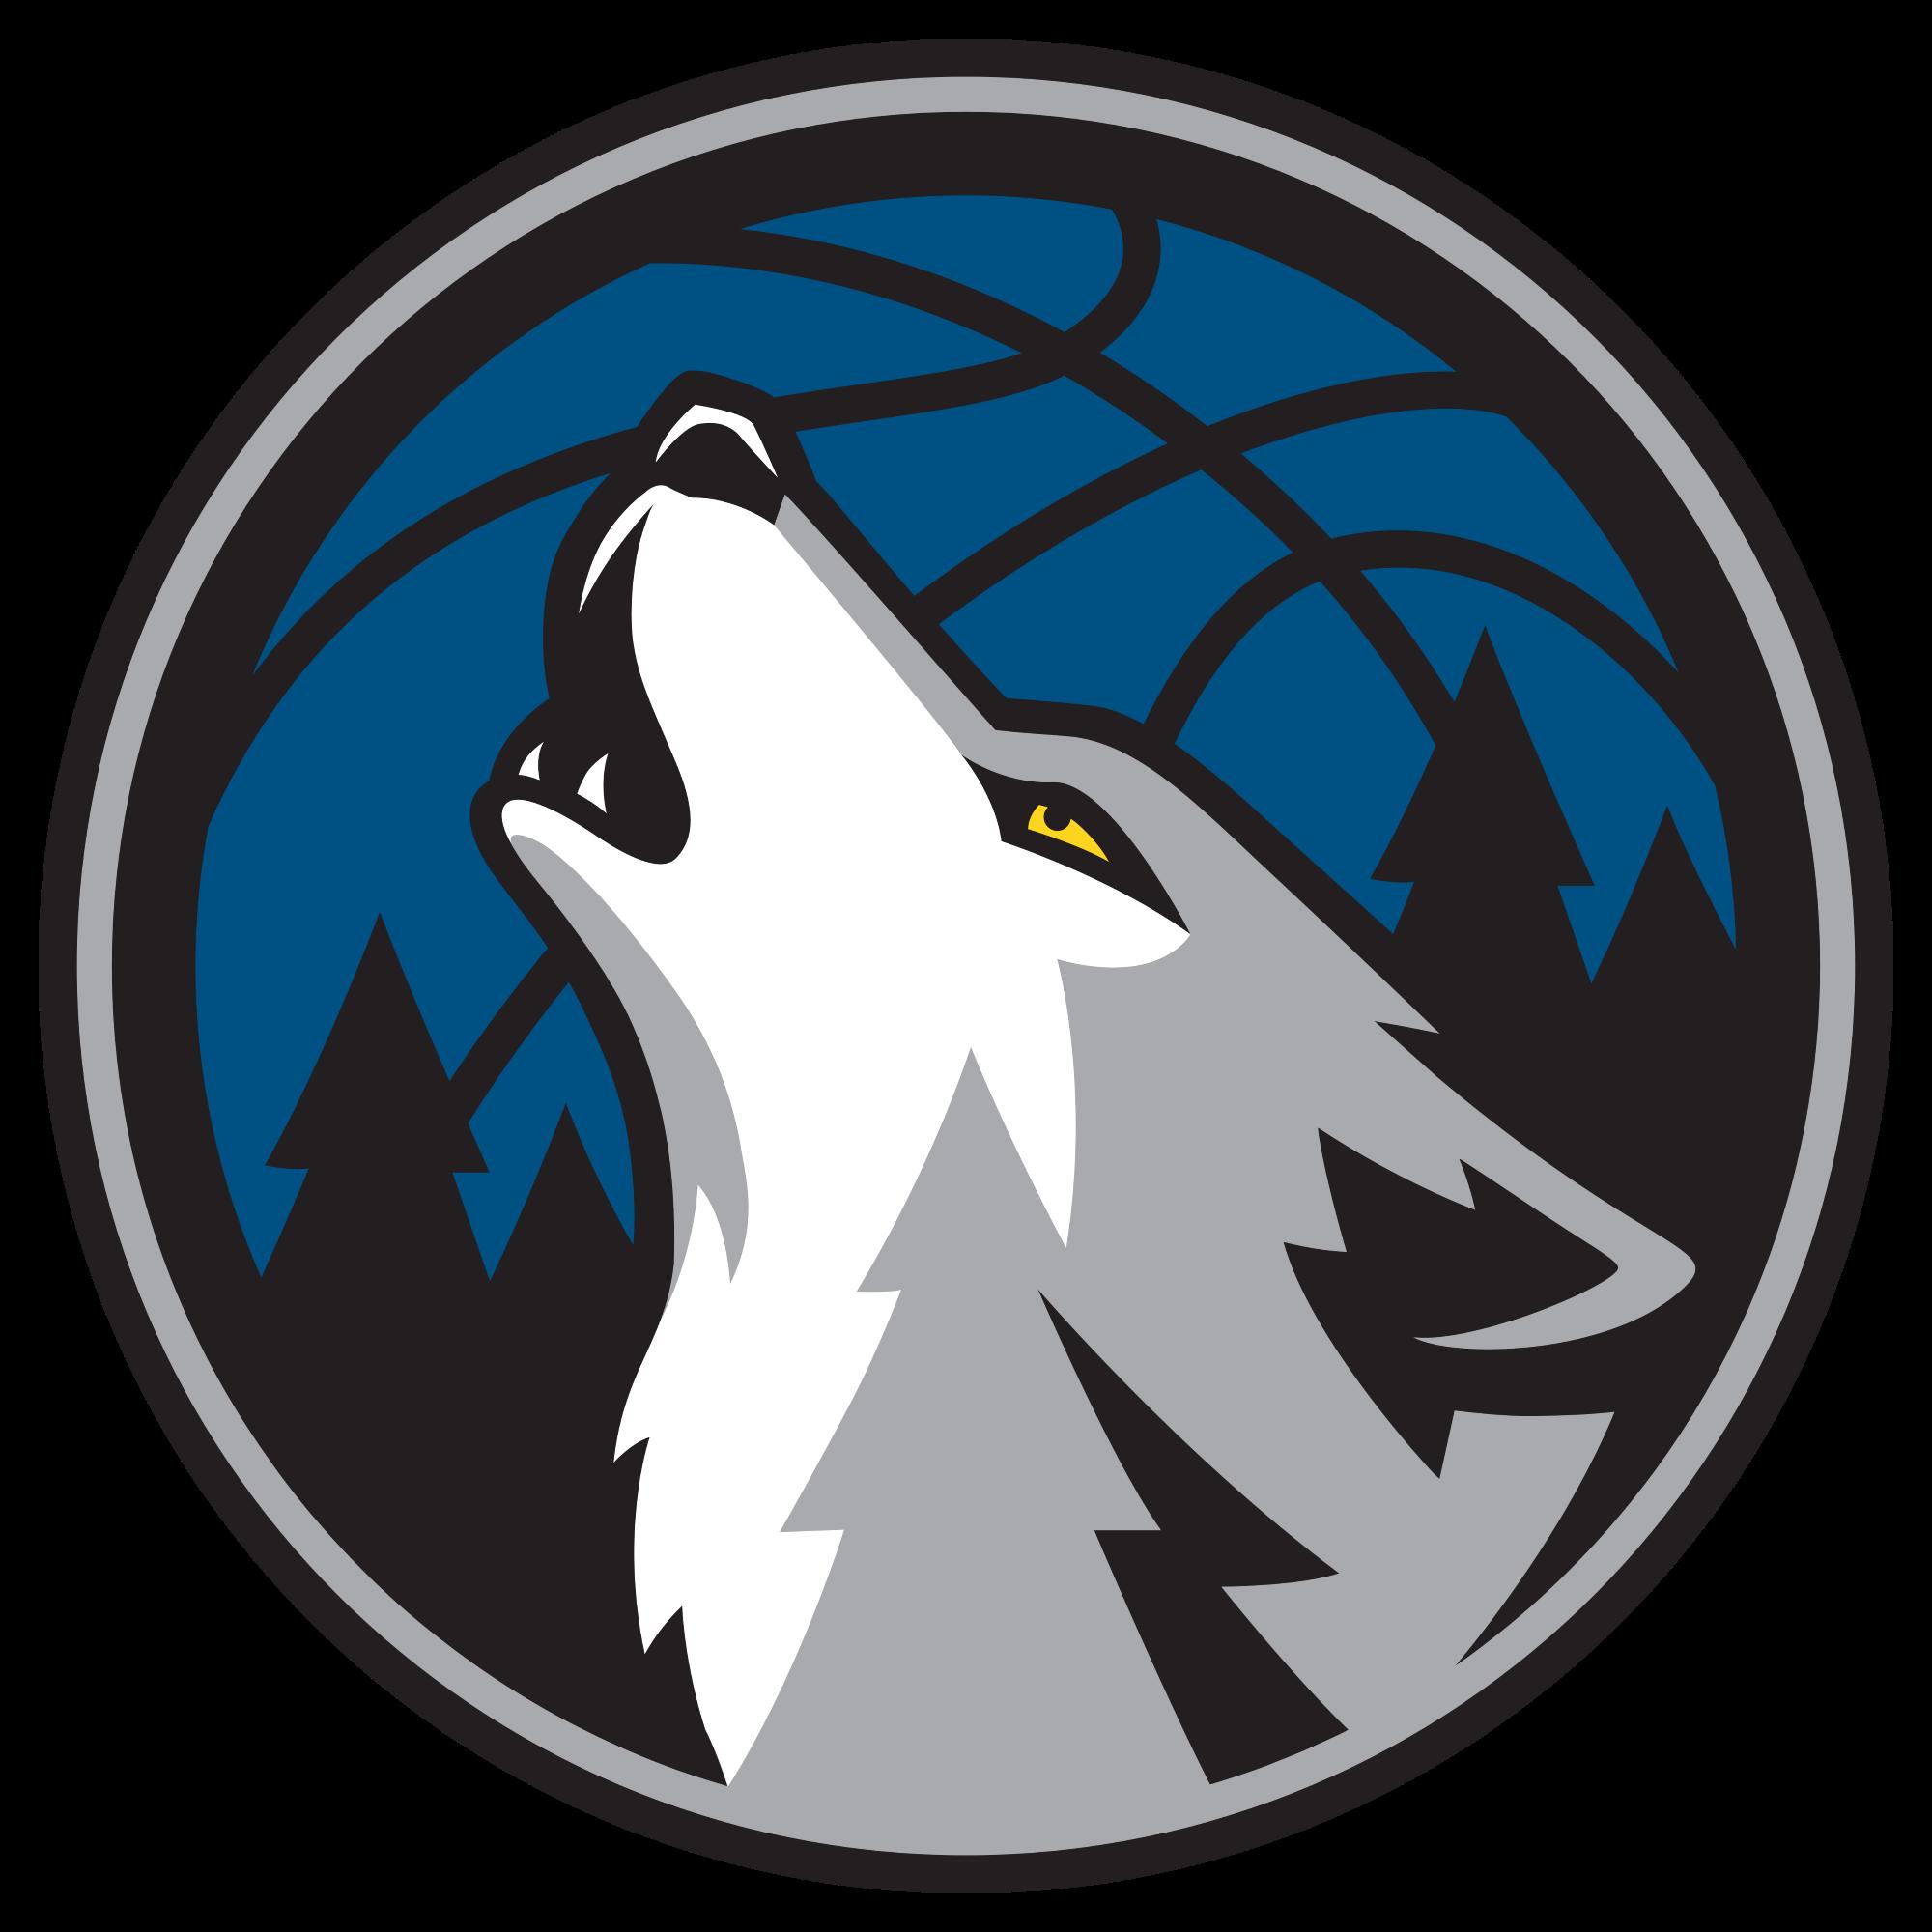 Minnesota Timberwolves – Logos Download